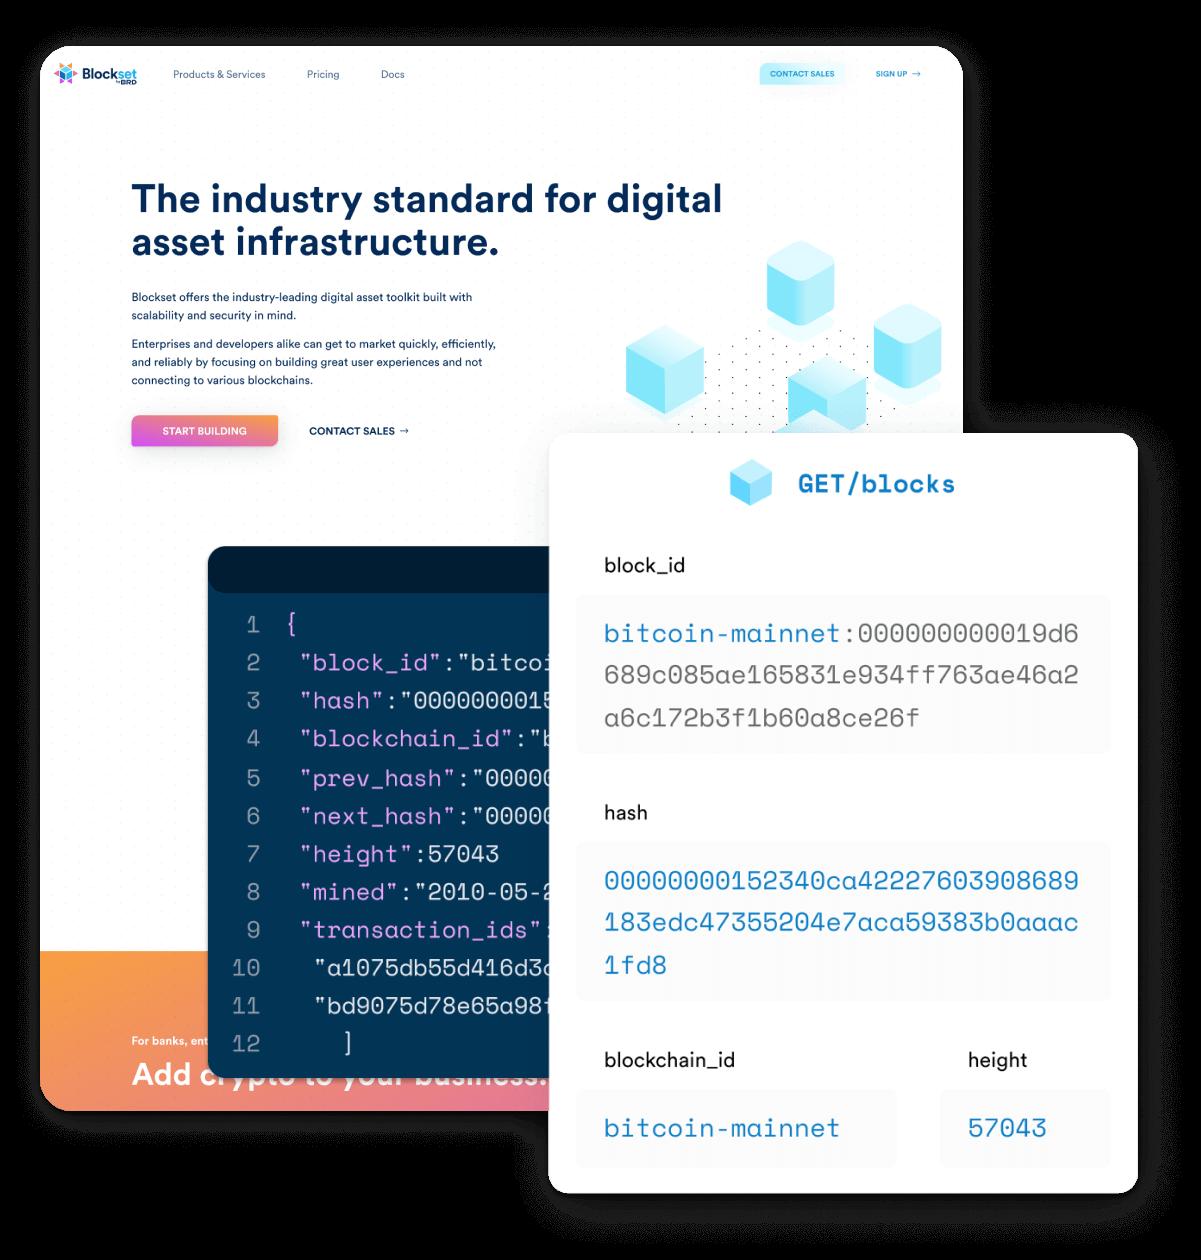 Screenshots of Blockset website and user interfaces